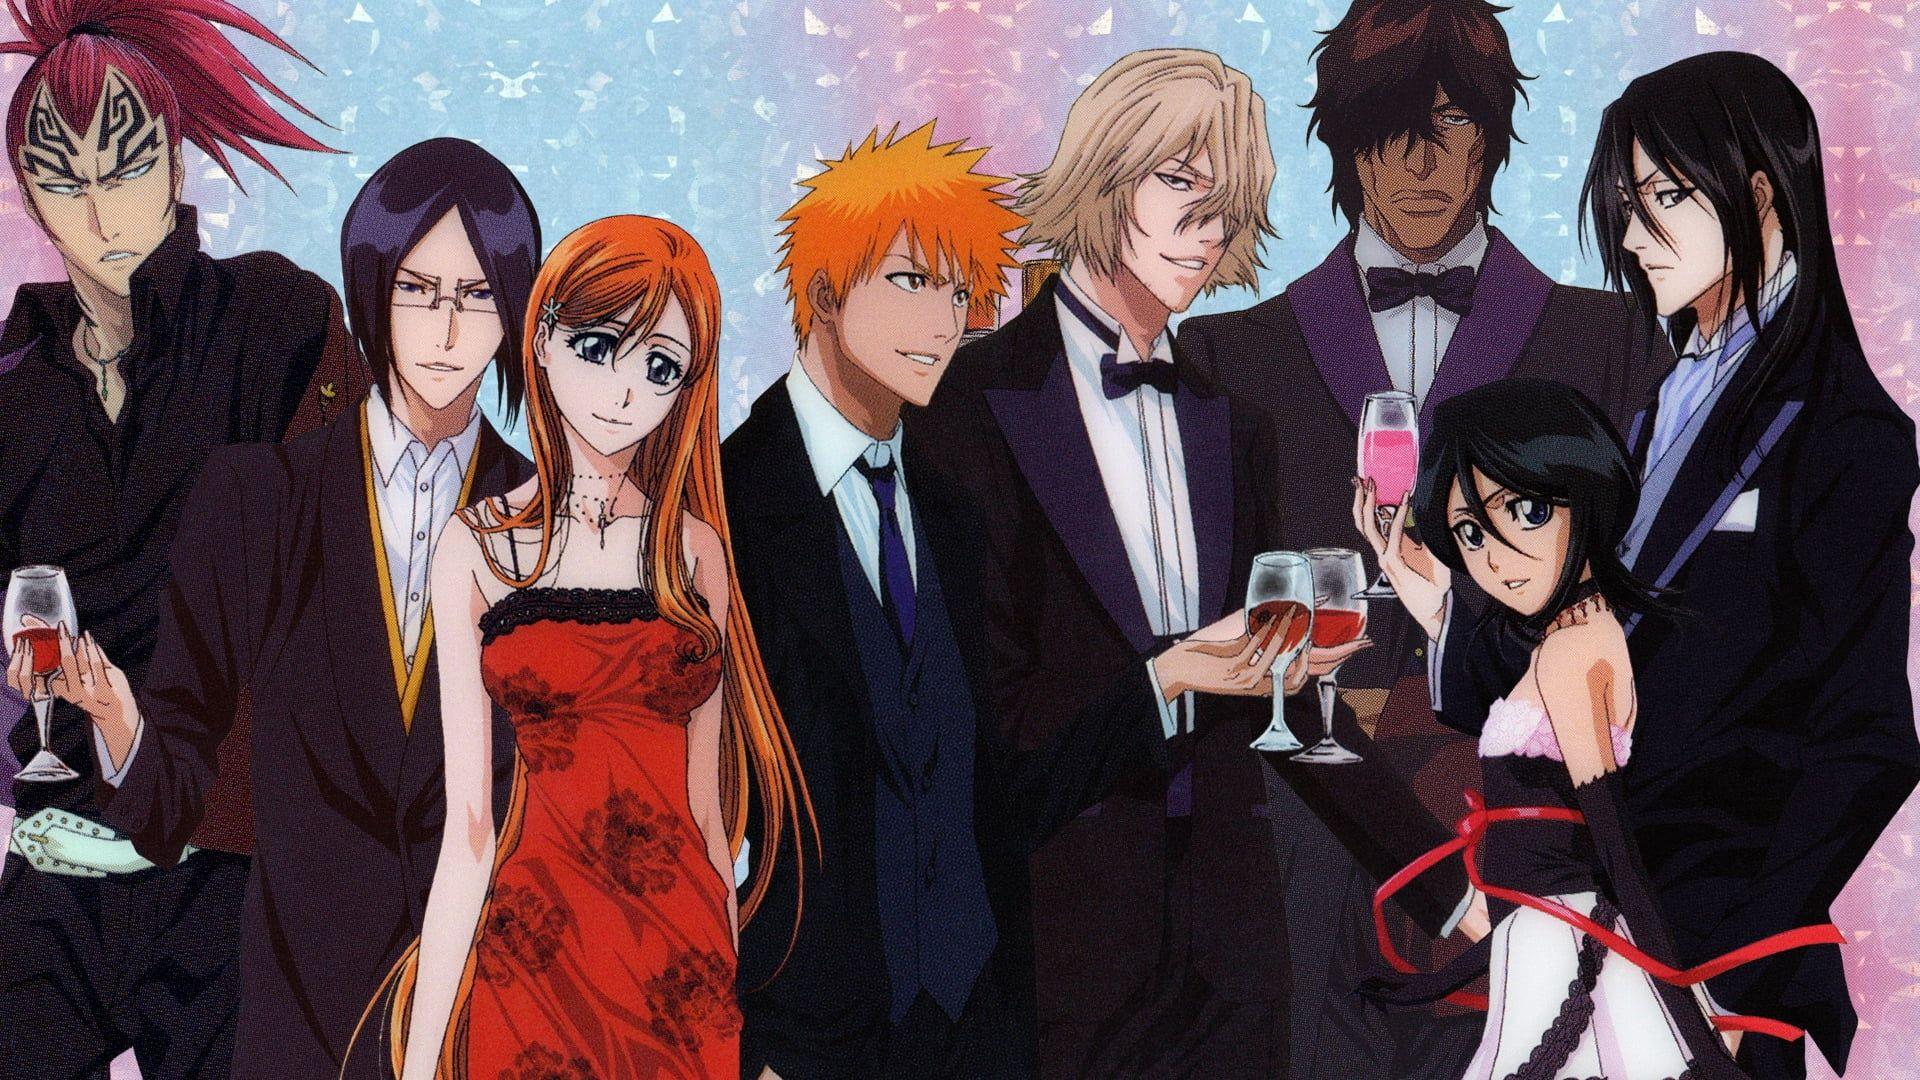 Bleach anime manga 1080P wallpaper hdwallpaper